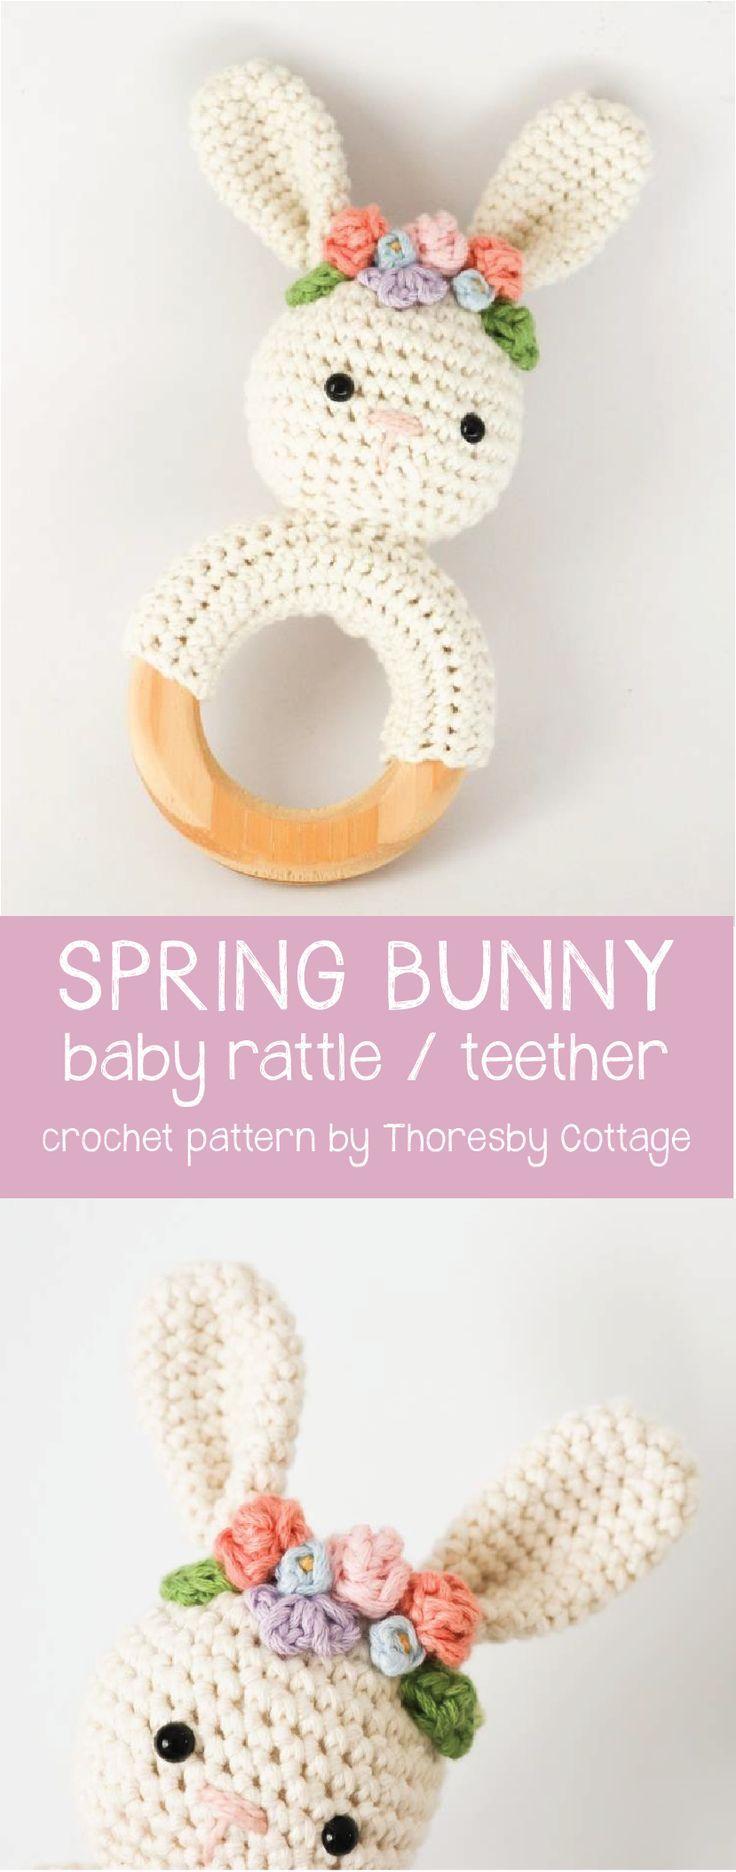 Spring bunny rattle crochet pattern – Katharina Z – PickPin